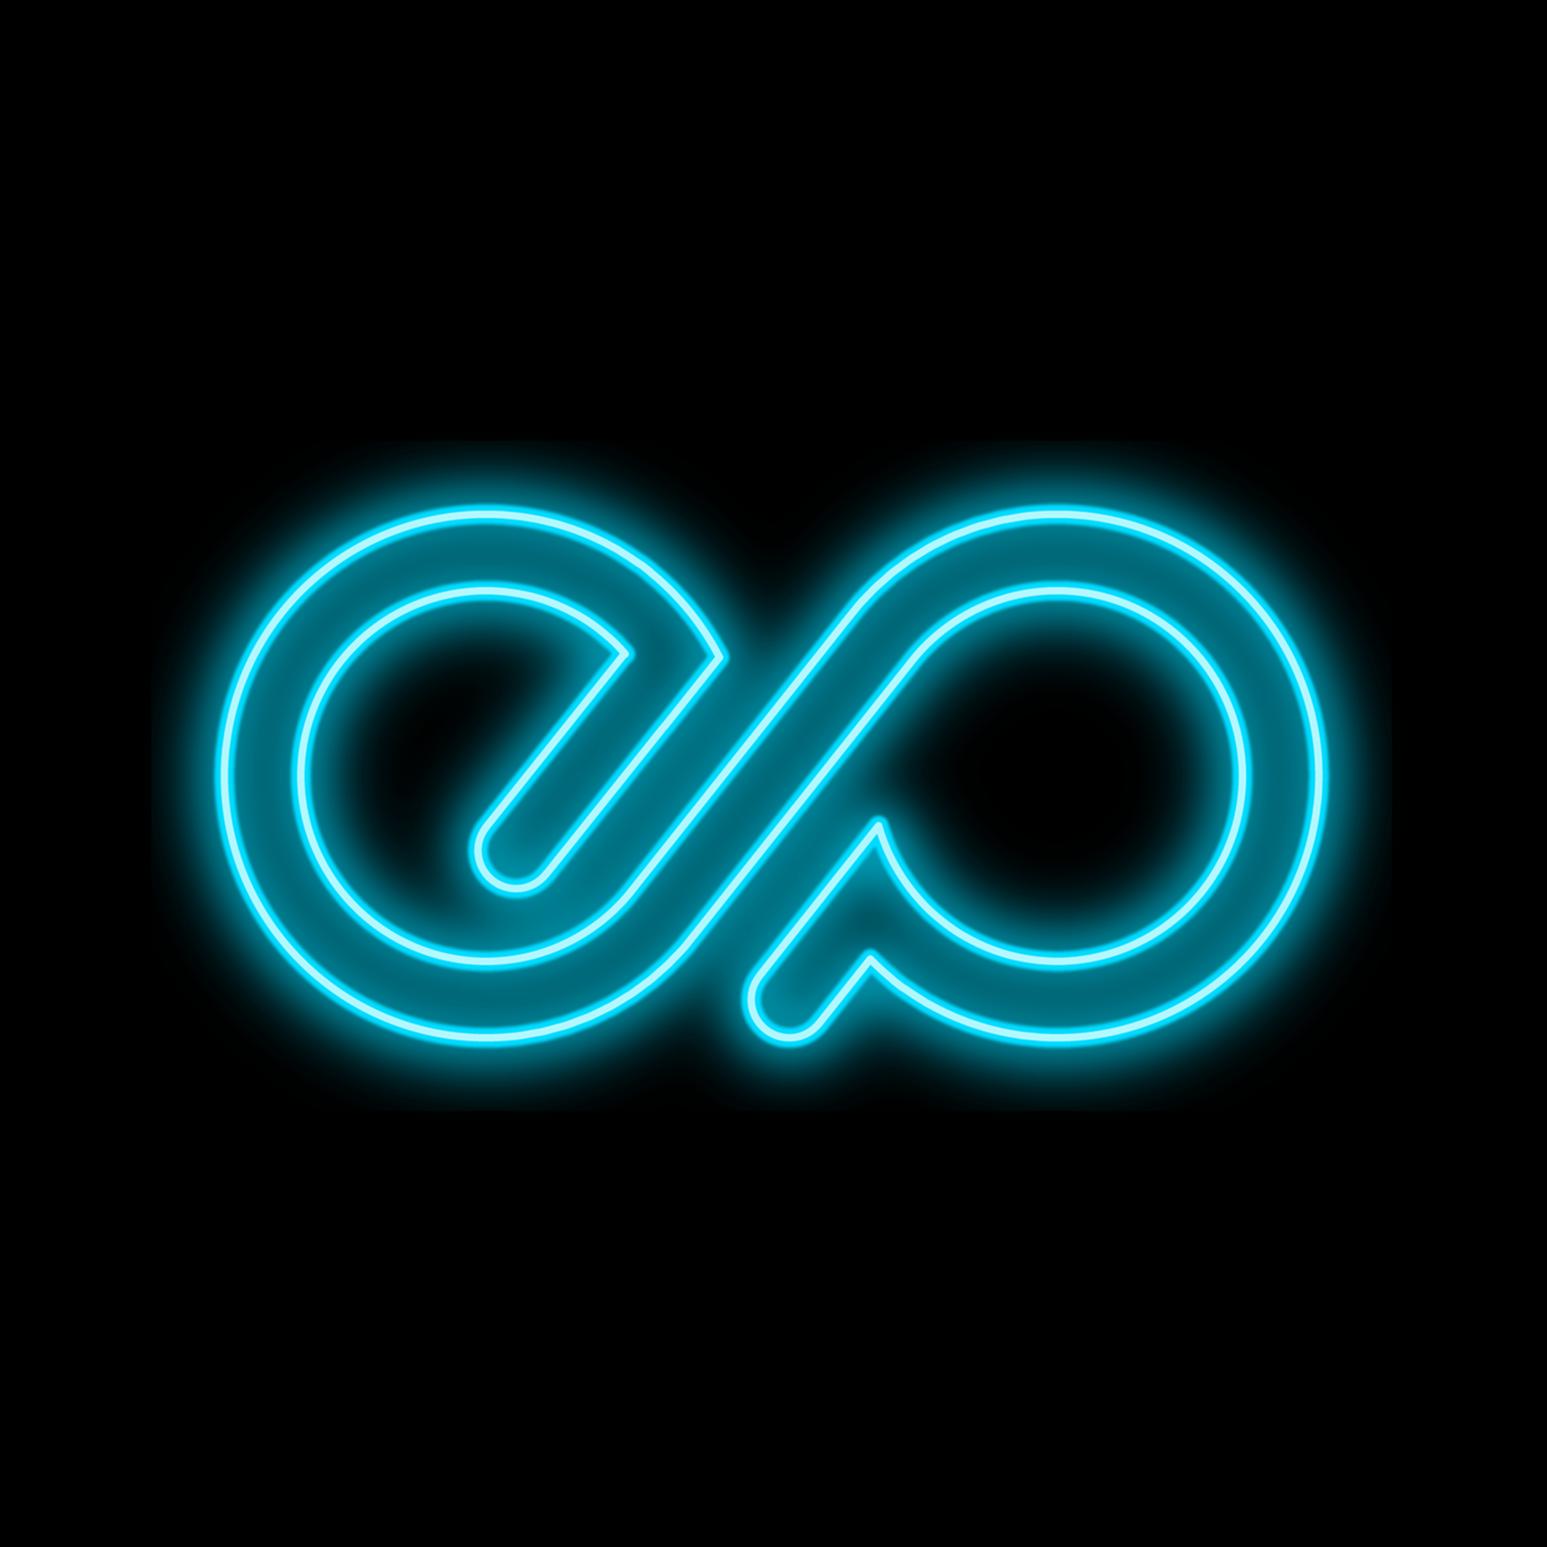 @heartsofficial Profile Image | Linktree